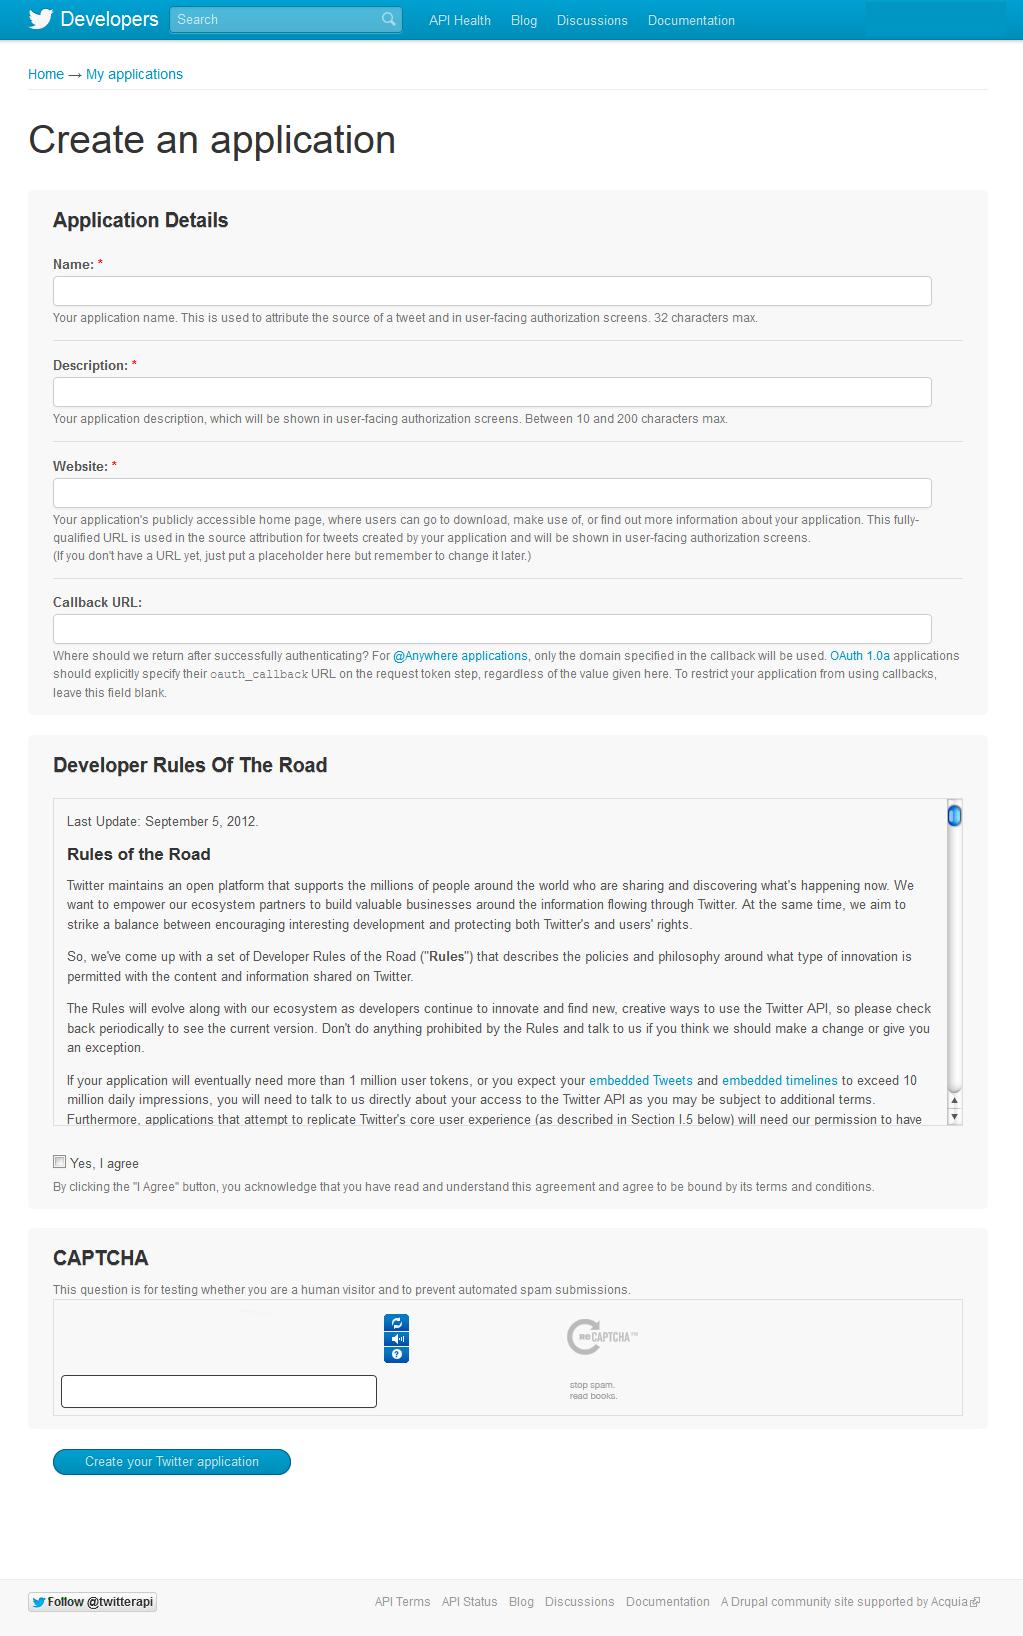 06. Tweetable - configurar aplicación